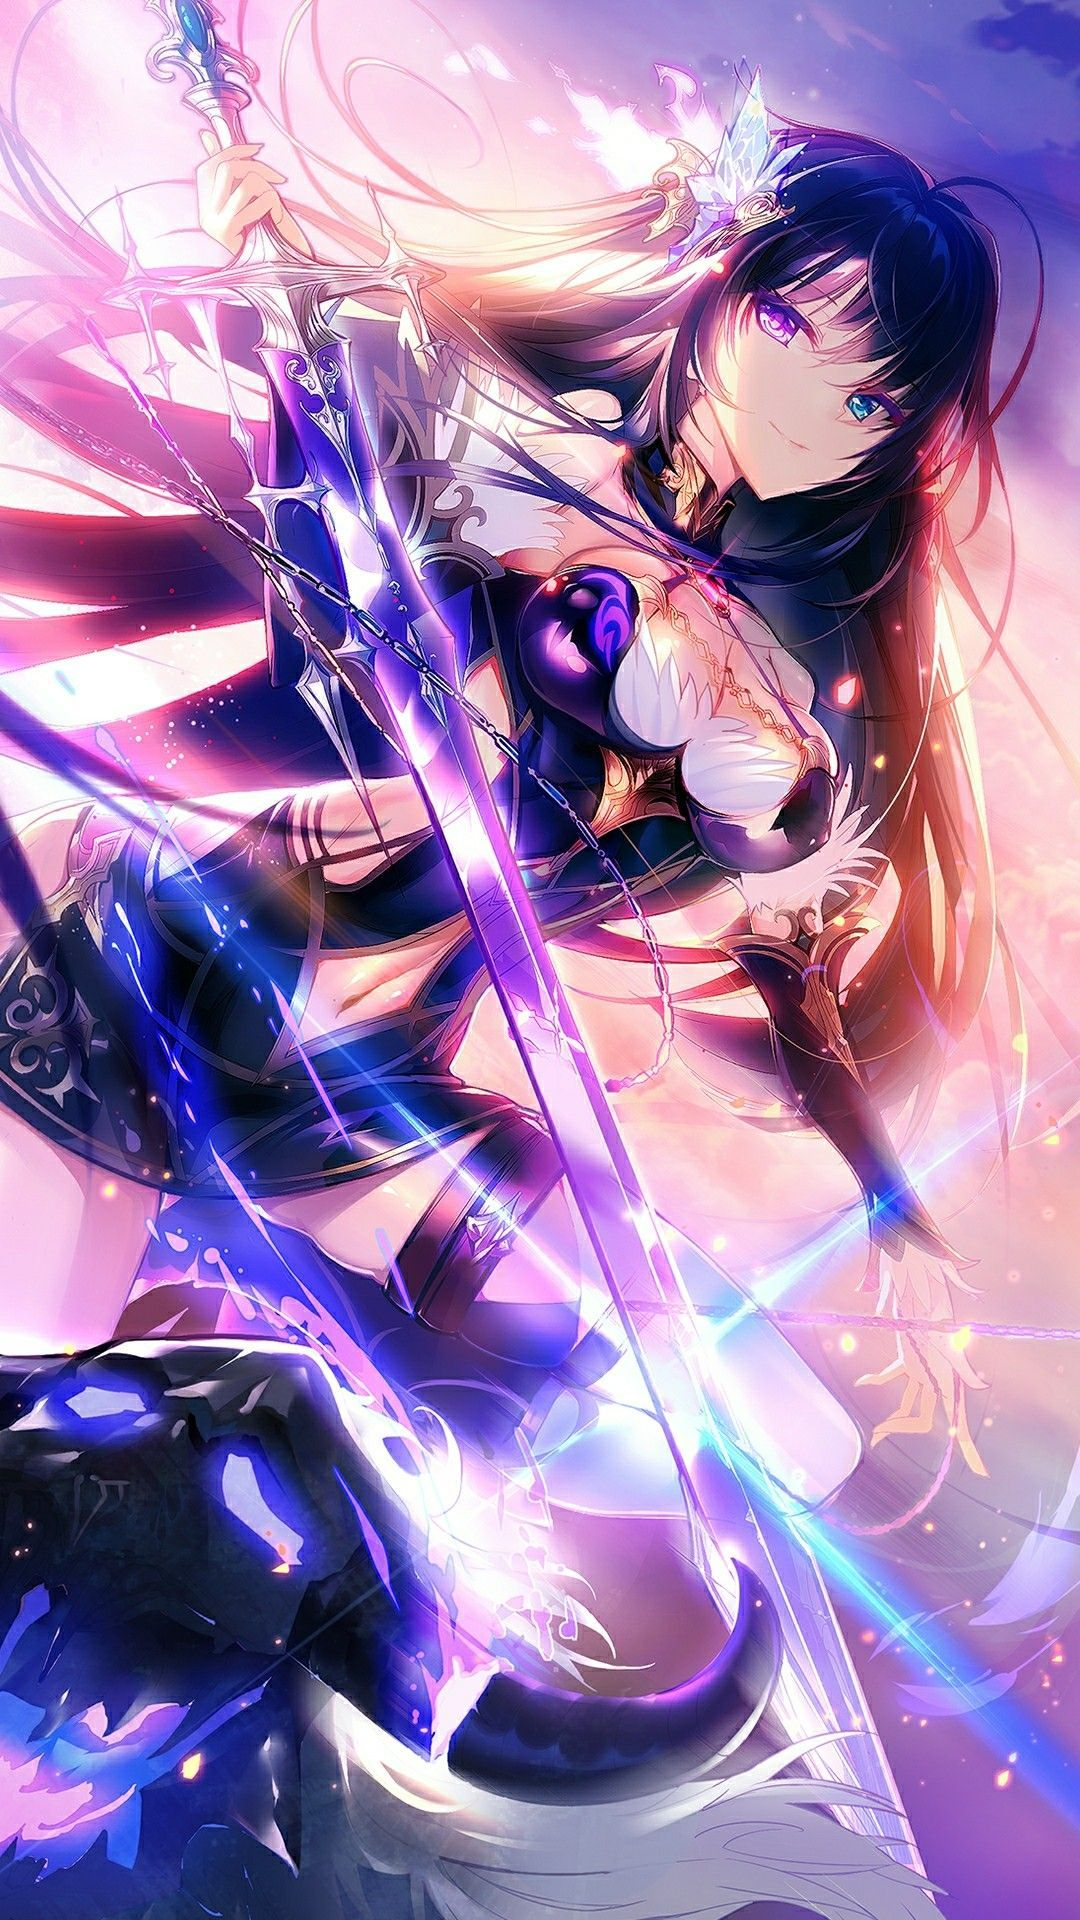 26 Anime Girl Hd Wallpaper For Android Anime Wallpaper